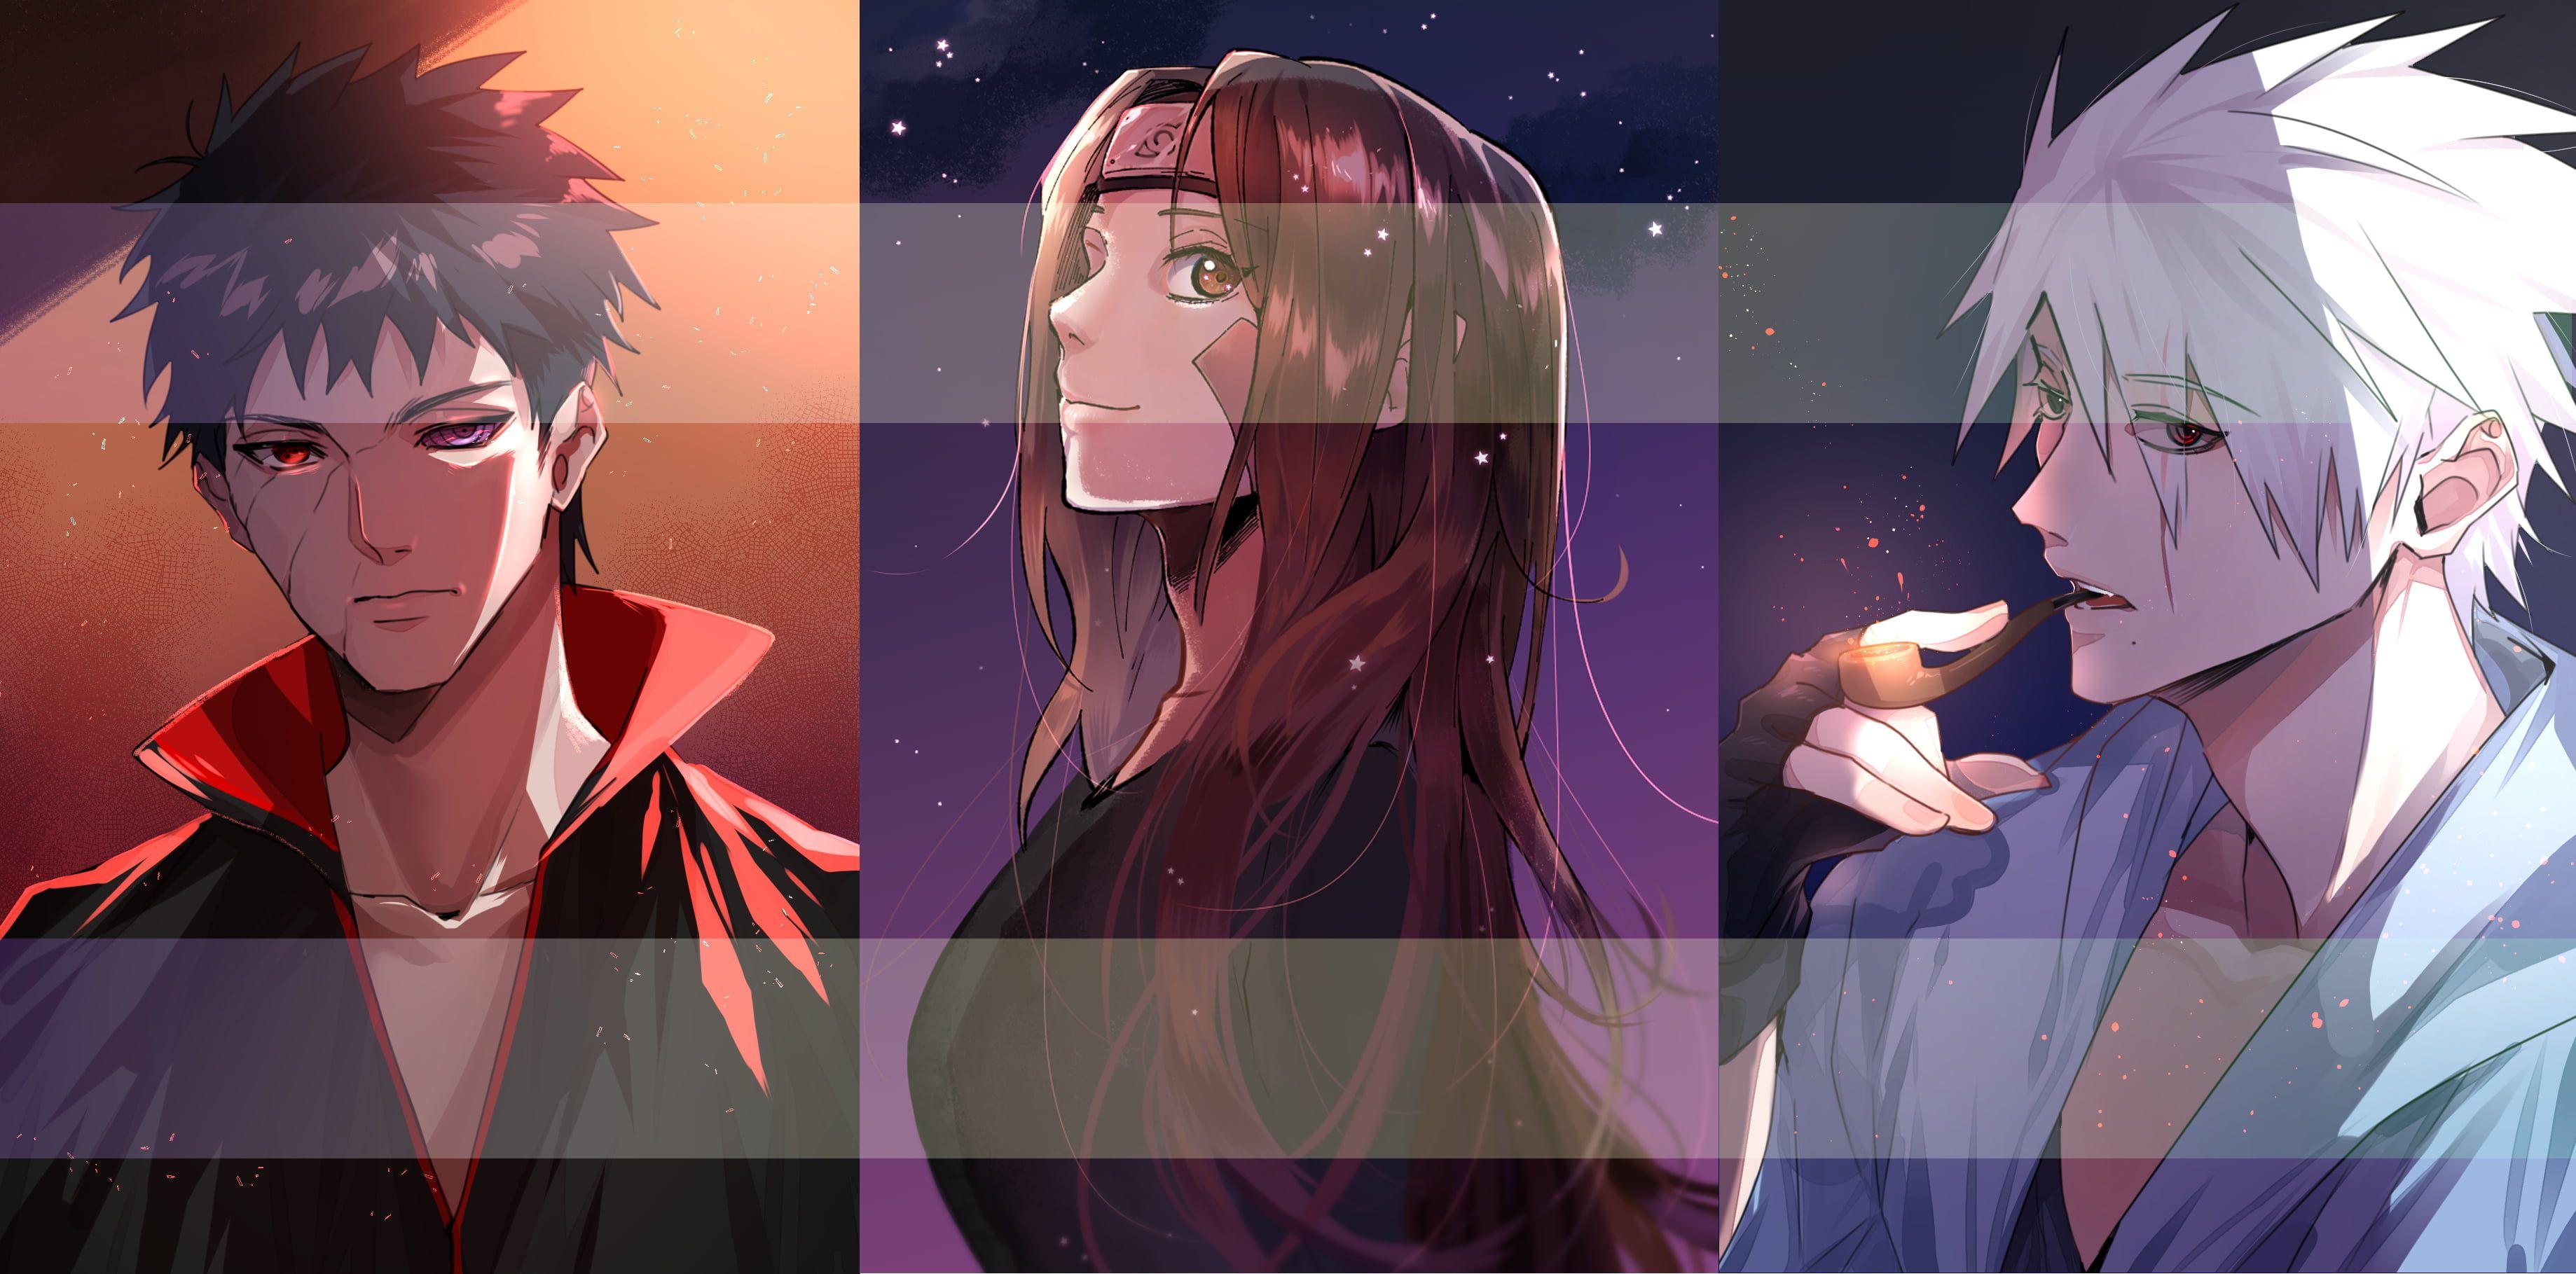 Naruto Kakashi Hatake Obito Uchiha Rin Nohara 2k Wallpaper Hdwallpaper Desktop In 2021 Dark Art Illustrations Naruto Shippuden Anime Anime